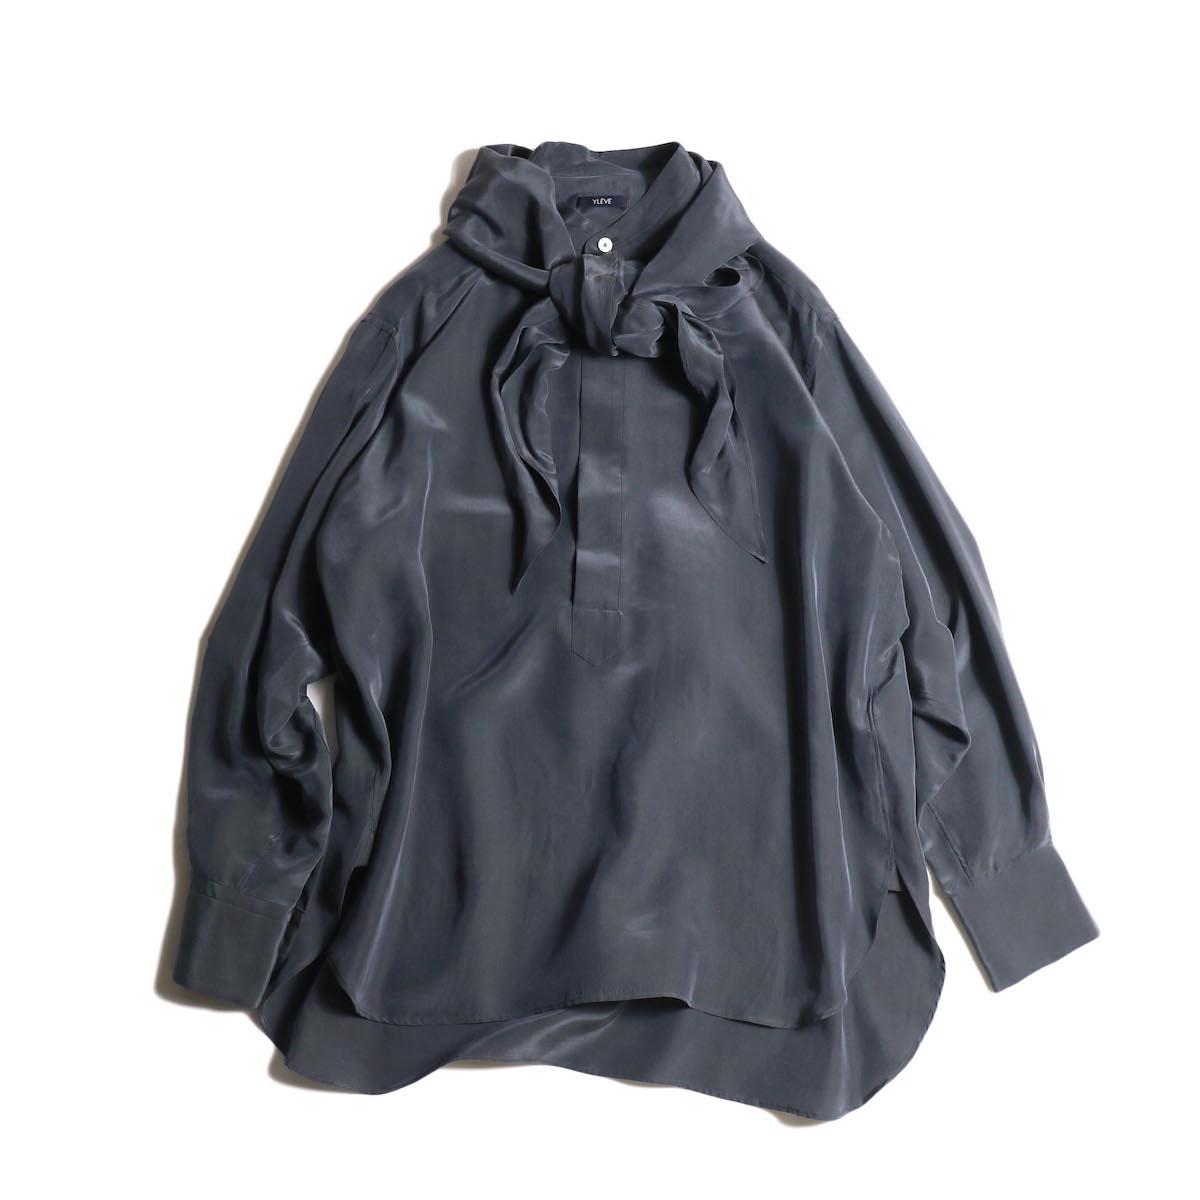 YLEVE / SILK CUPRA SUEDE BL (charcoal) スカーフ付き 正面